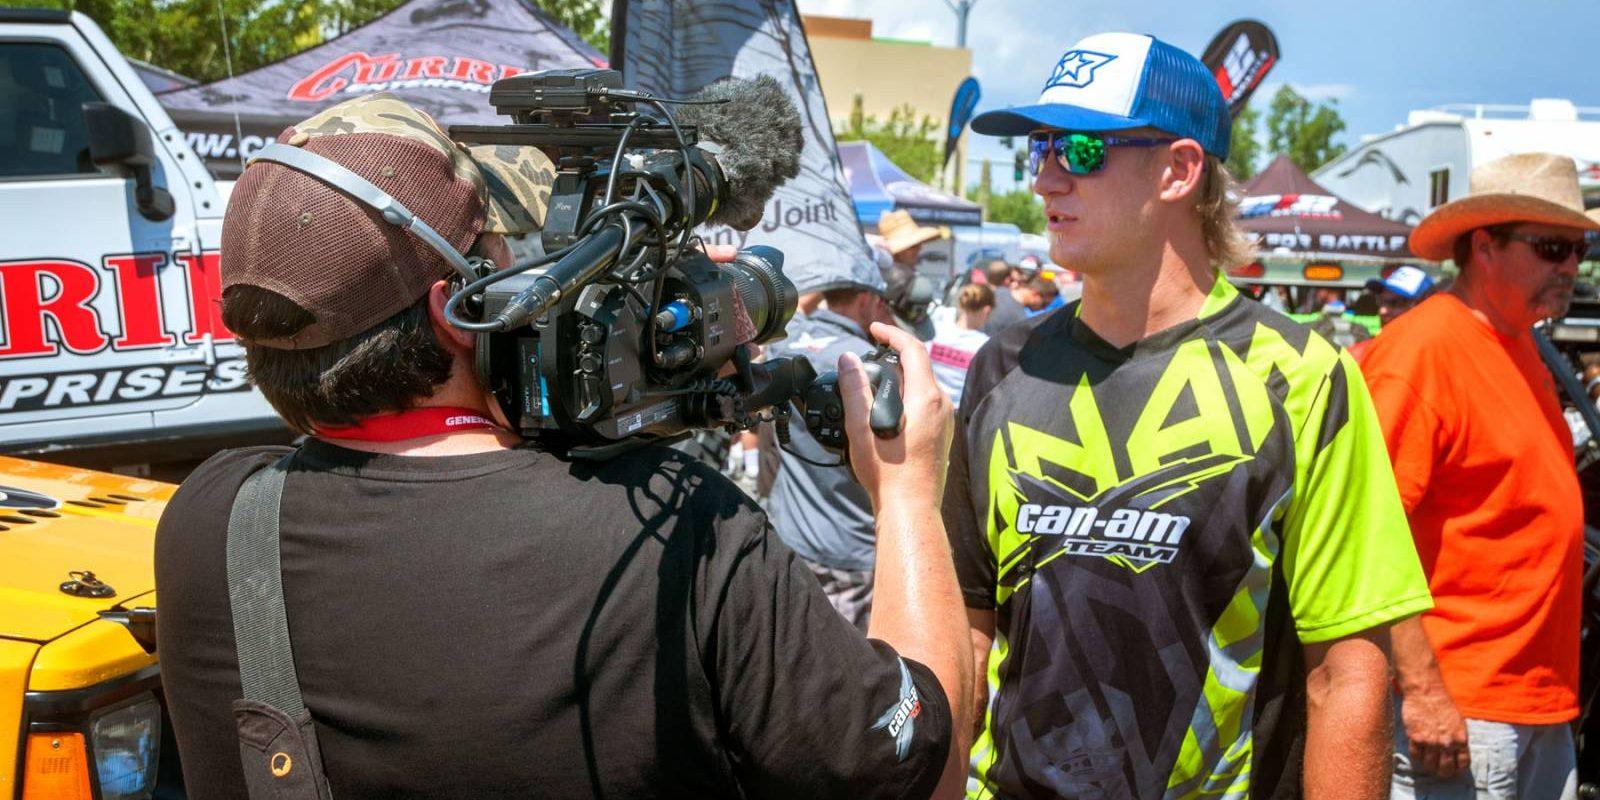 Dustin Jones And S3 Racing - UTV Sports Magazine